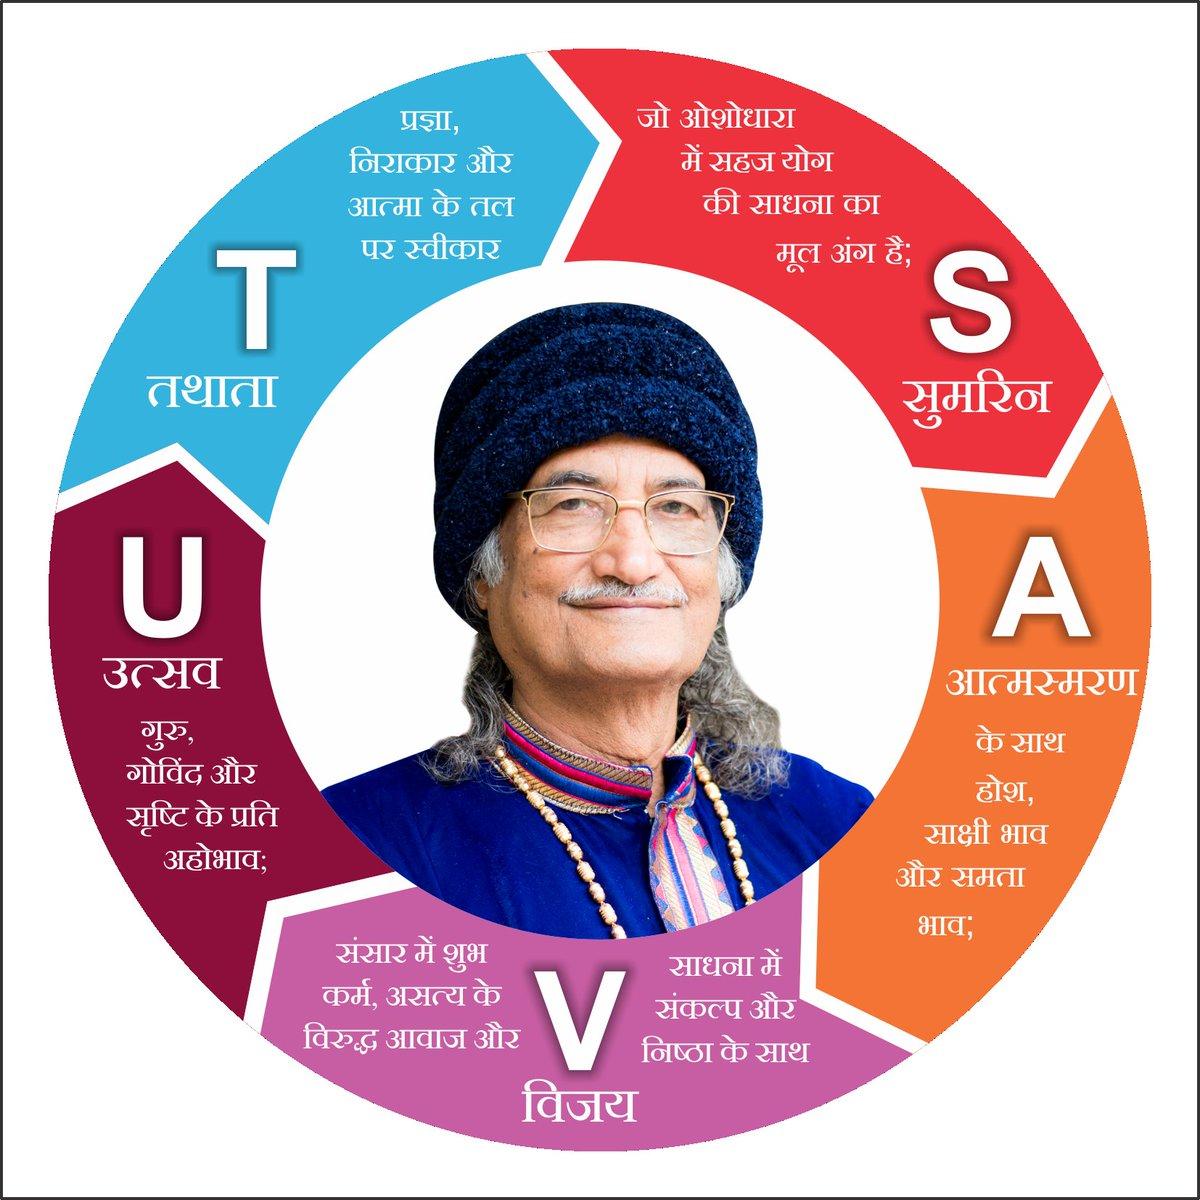 #UTSAV 🌹  On this Gurupurnima, Sadguru gifted us the message of 'UTSAV' in his 'Aasheesh Vachan' 💐  @SiddharthAulia Ji #SunoBhaiSadho #celebration #gratitude #acceptance #victory #spirituality #selfcare #joy #happiness #personalgrowth #growthhacking #personaldevelopment #quotes https://t.co/ap9fHrYgoK